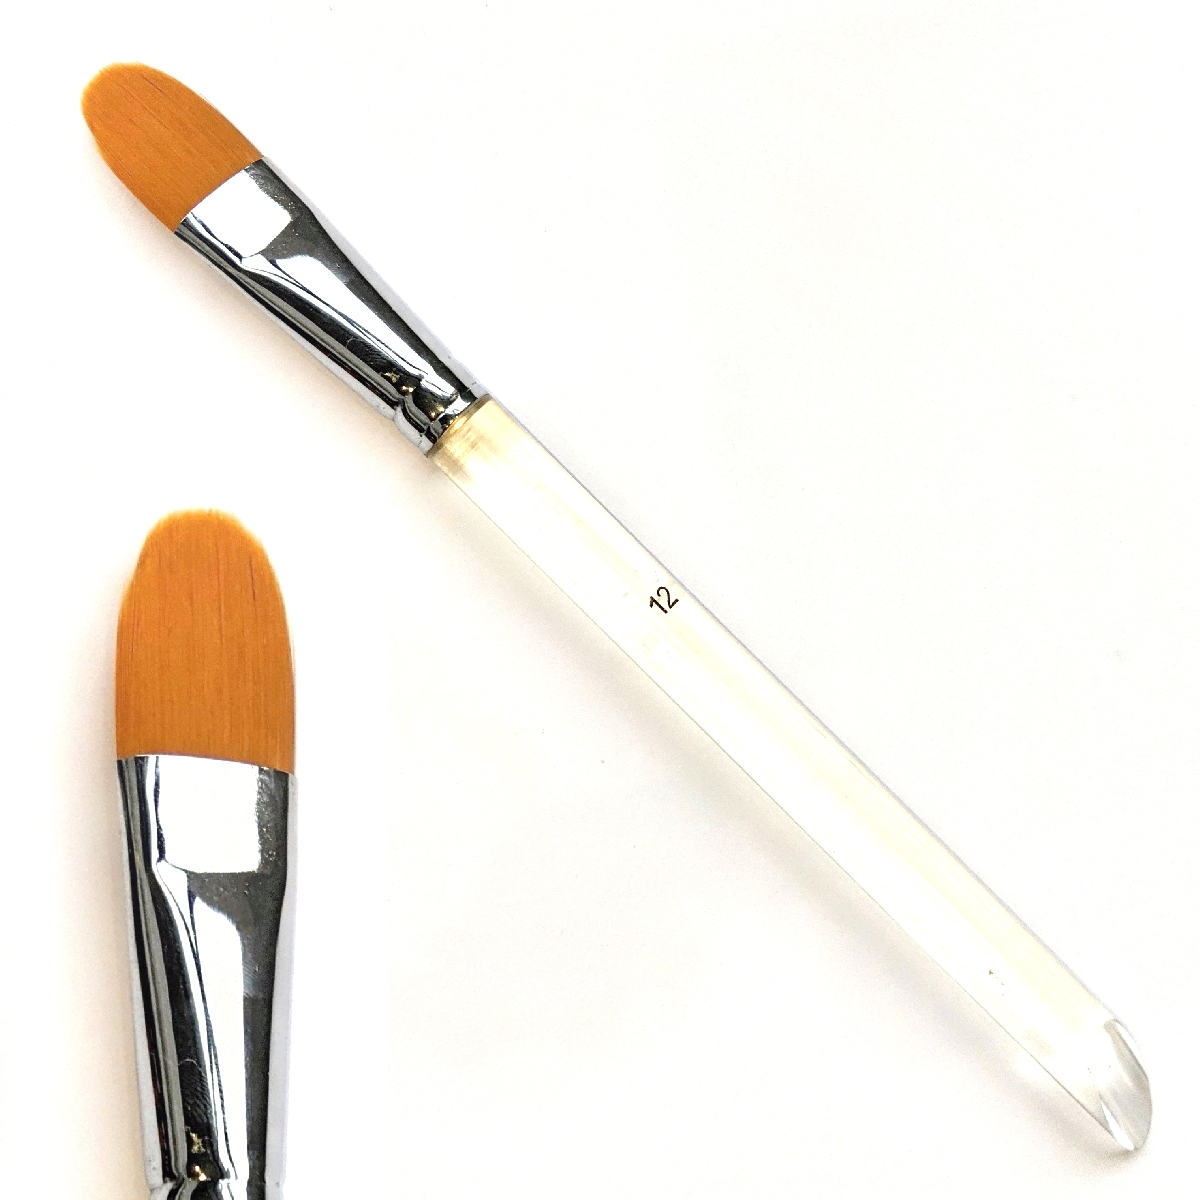 TAG Filbert Brush #12 : 3/4 inch